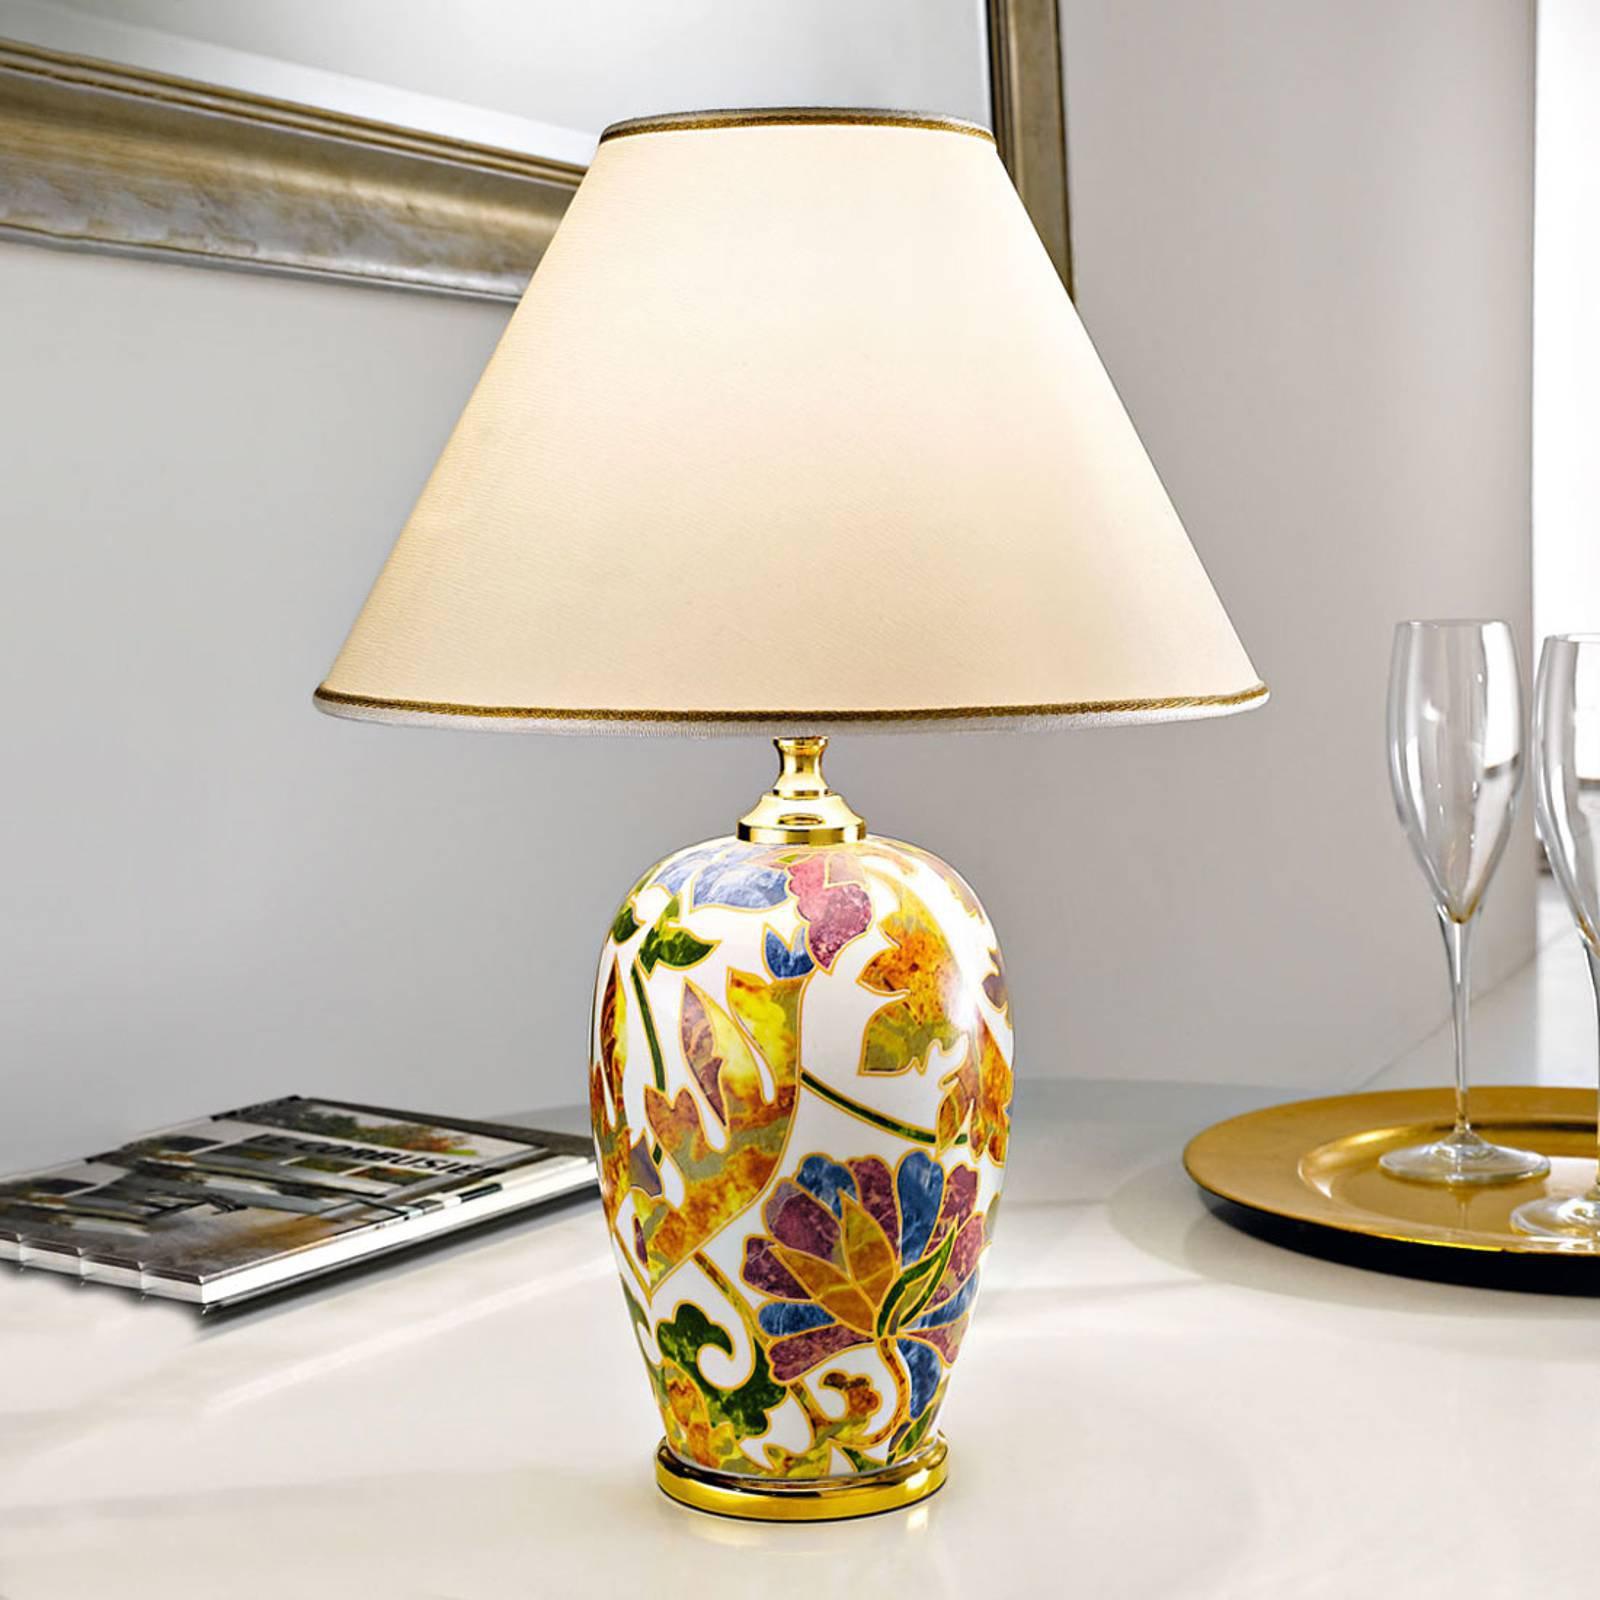 Bordlampe Damasco med 24 karat gull, Ø 30 cm